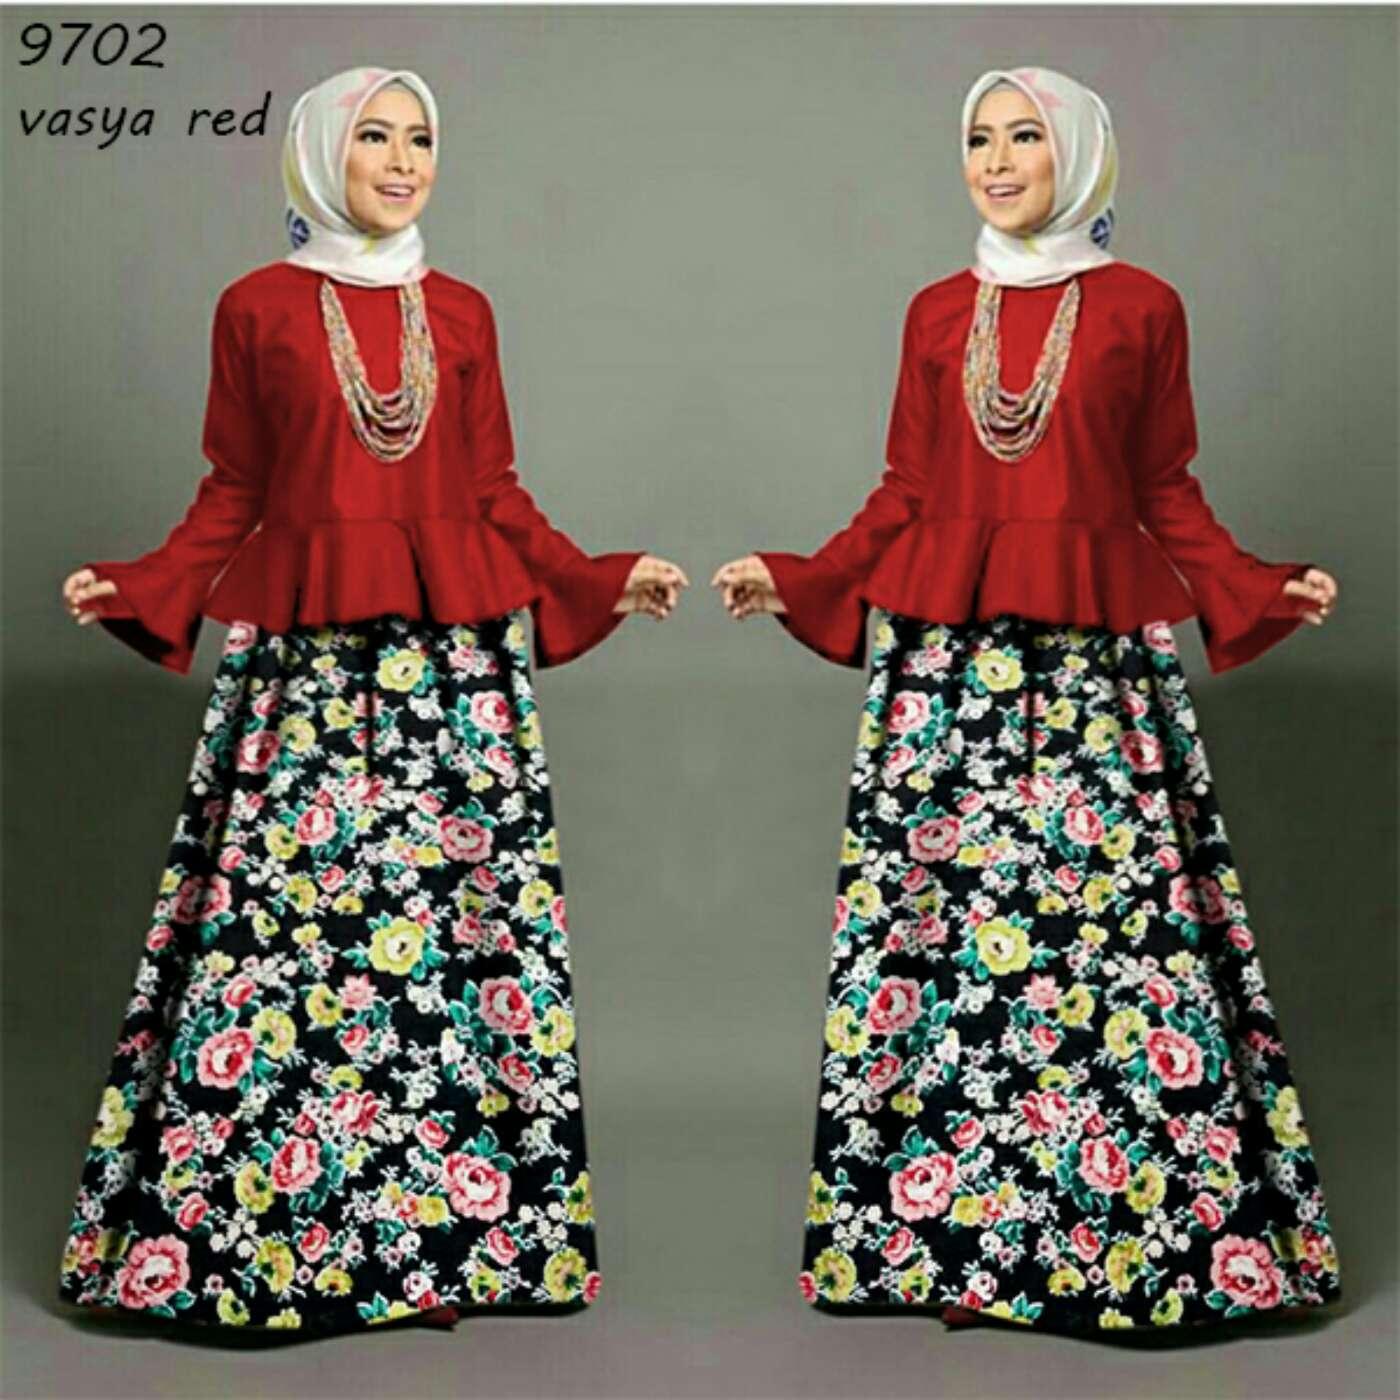 Setelan Hijab Modis Baju dan Rok Modern Cantik Model Terbaru